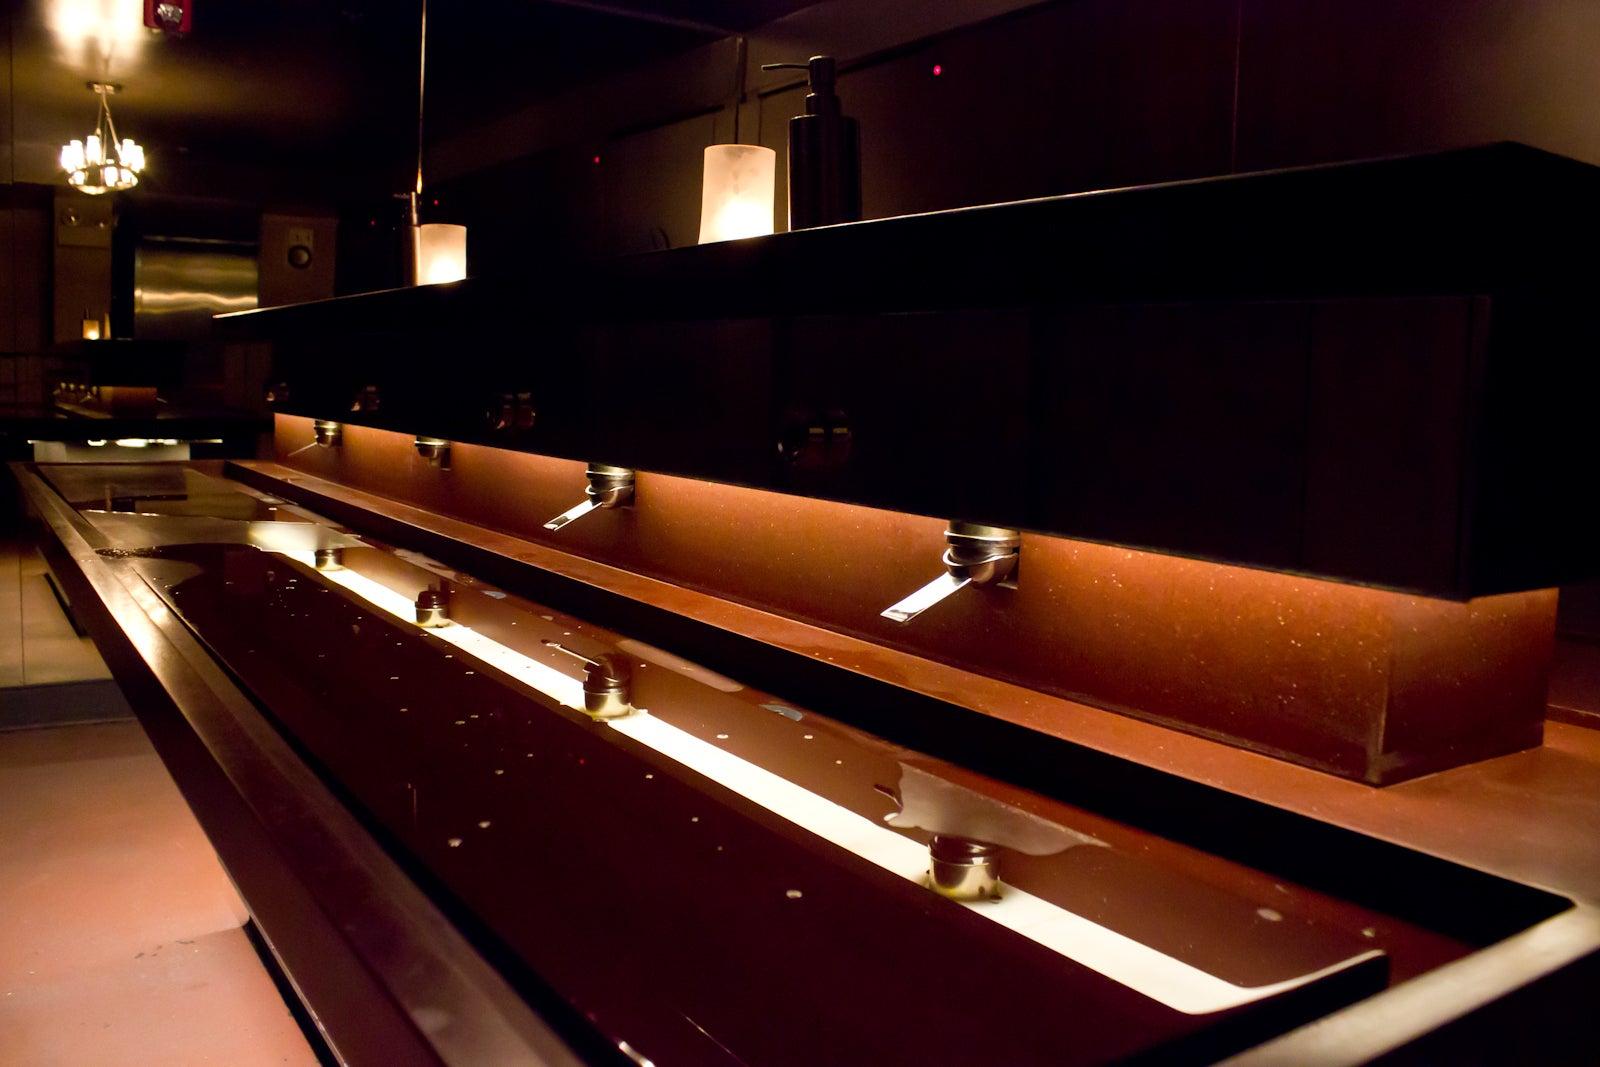 coolest bathrooms san francisco - best restaurant bathrooms san franci